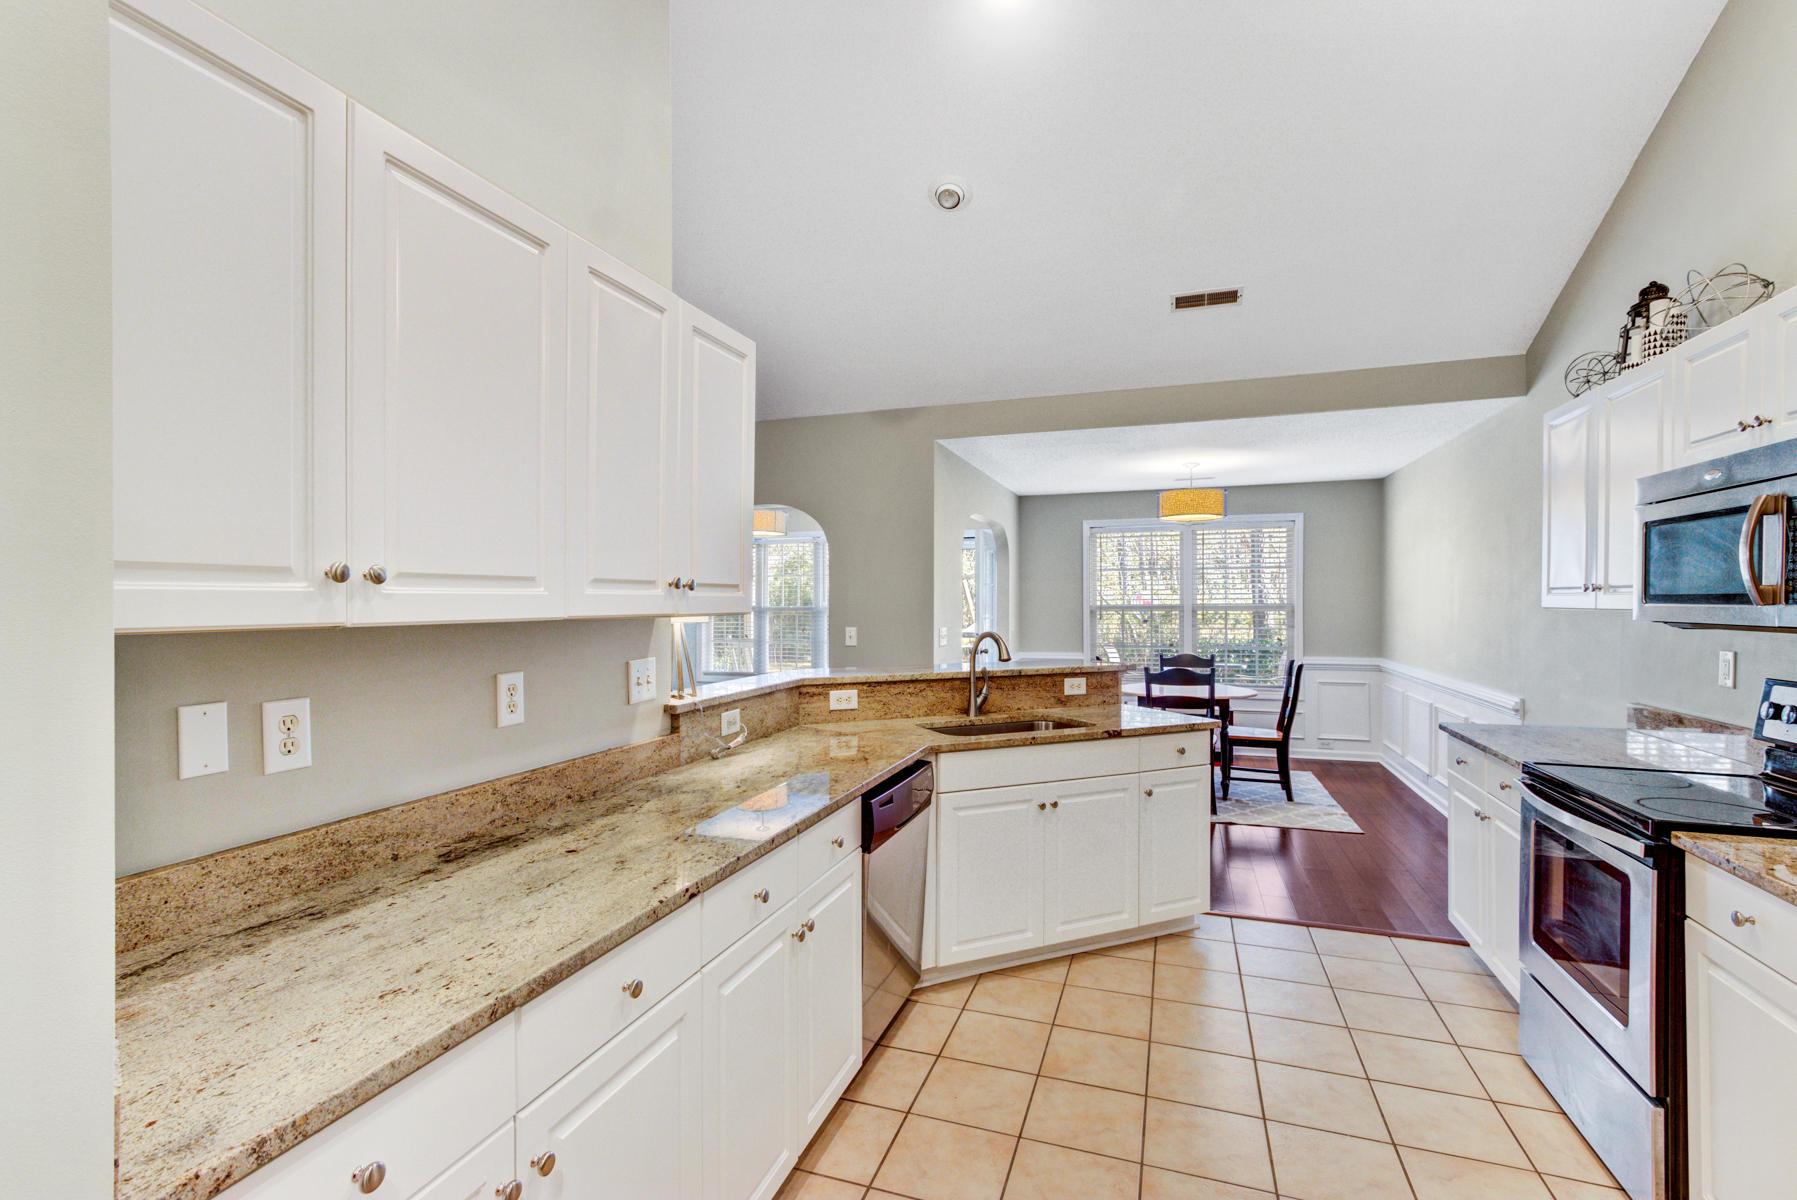 Park West Homes For Sale - 3444 Wellesley, Mount Pleasant, SC - 18